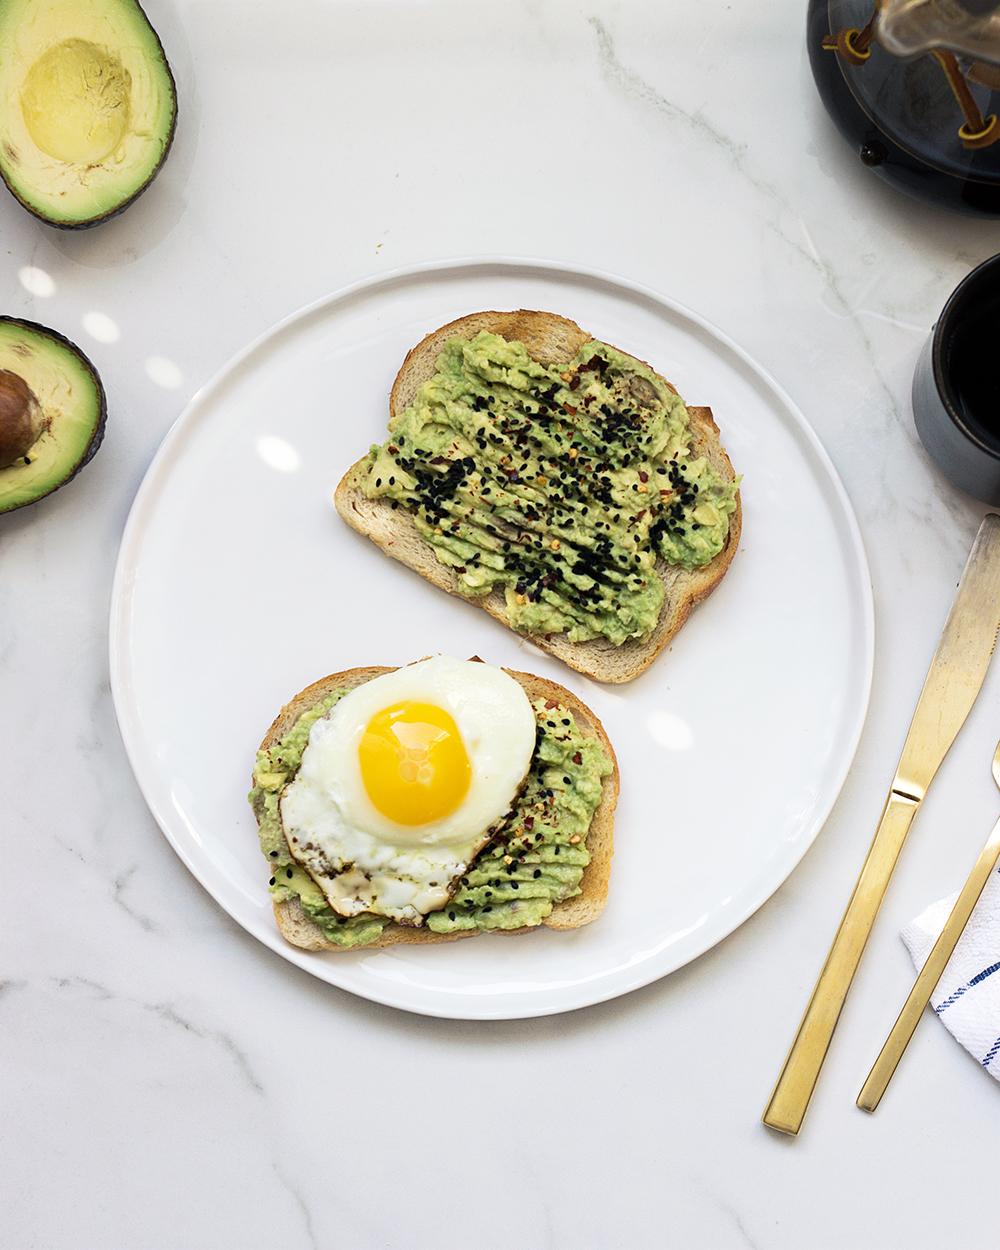 livvyland-blog-olivia-watson-ultimate-avocado-toast-recipe-best-avo-breakfast-idea-jessica-lee